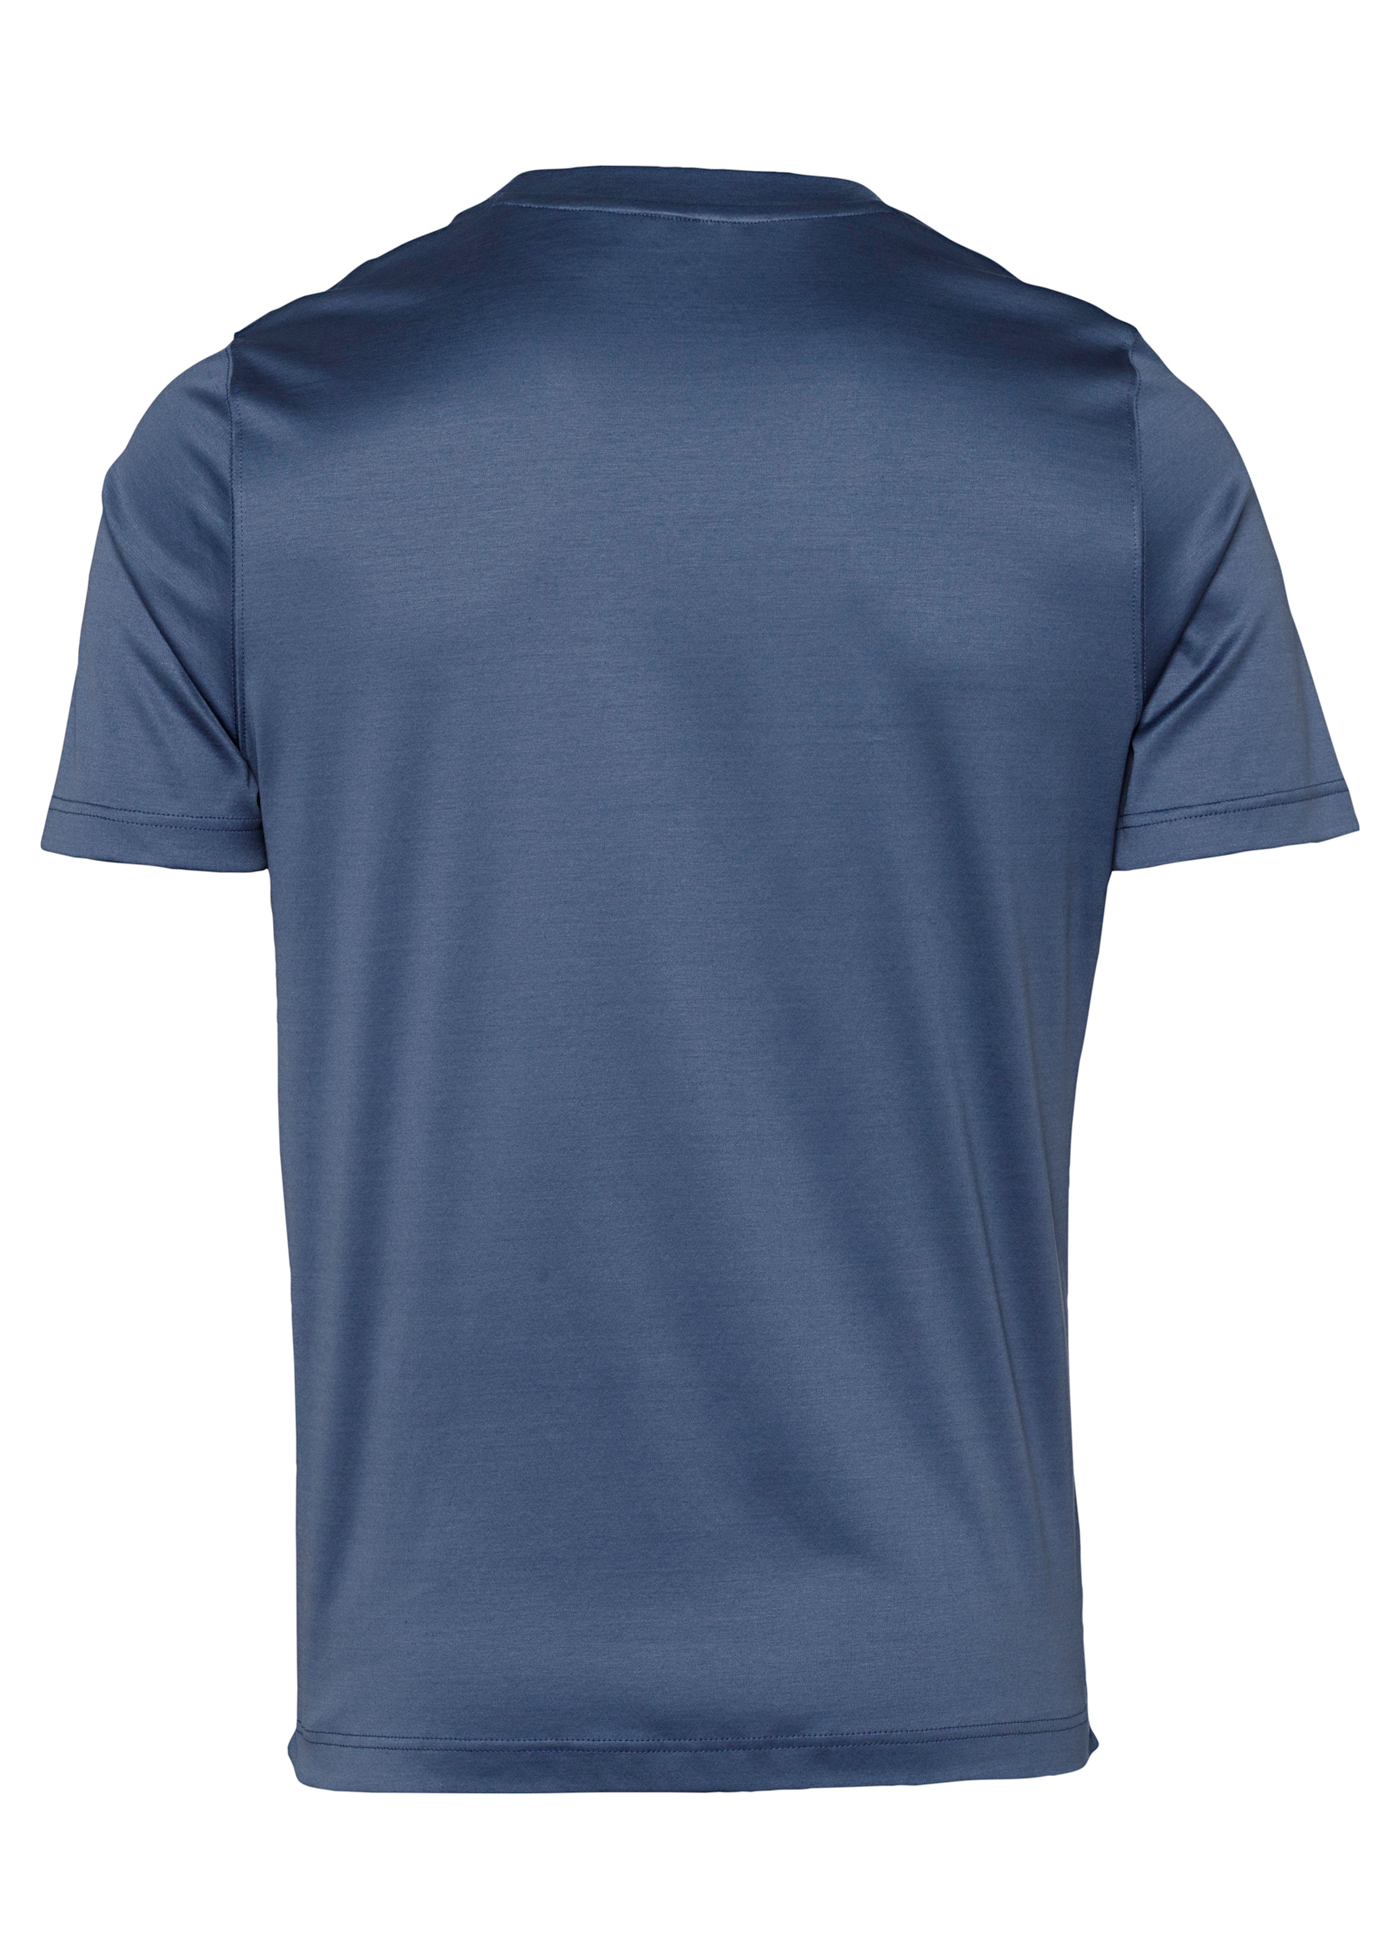 1000023561409 Men shirt: Casual / Jersey image number 1